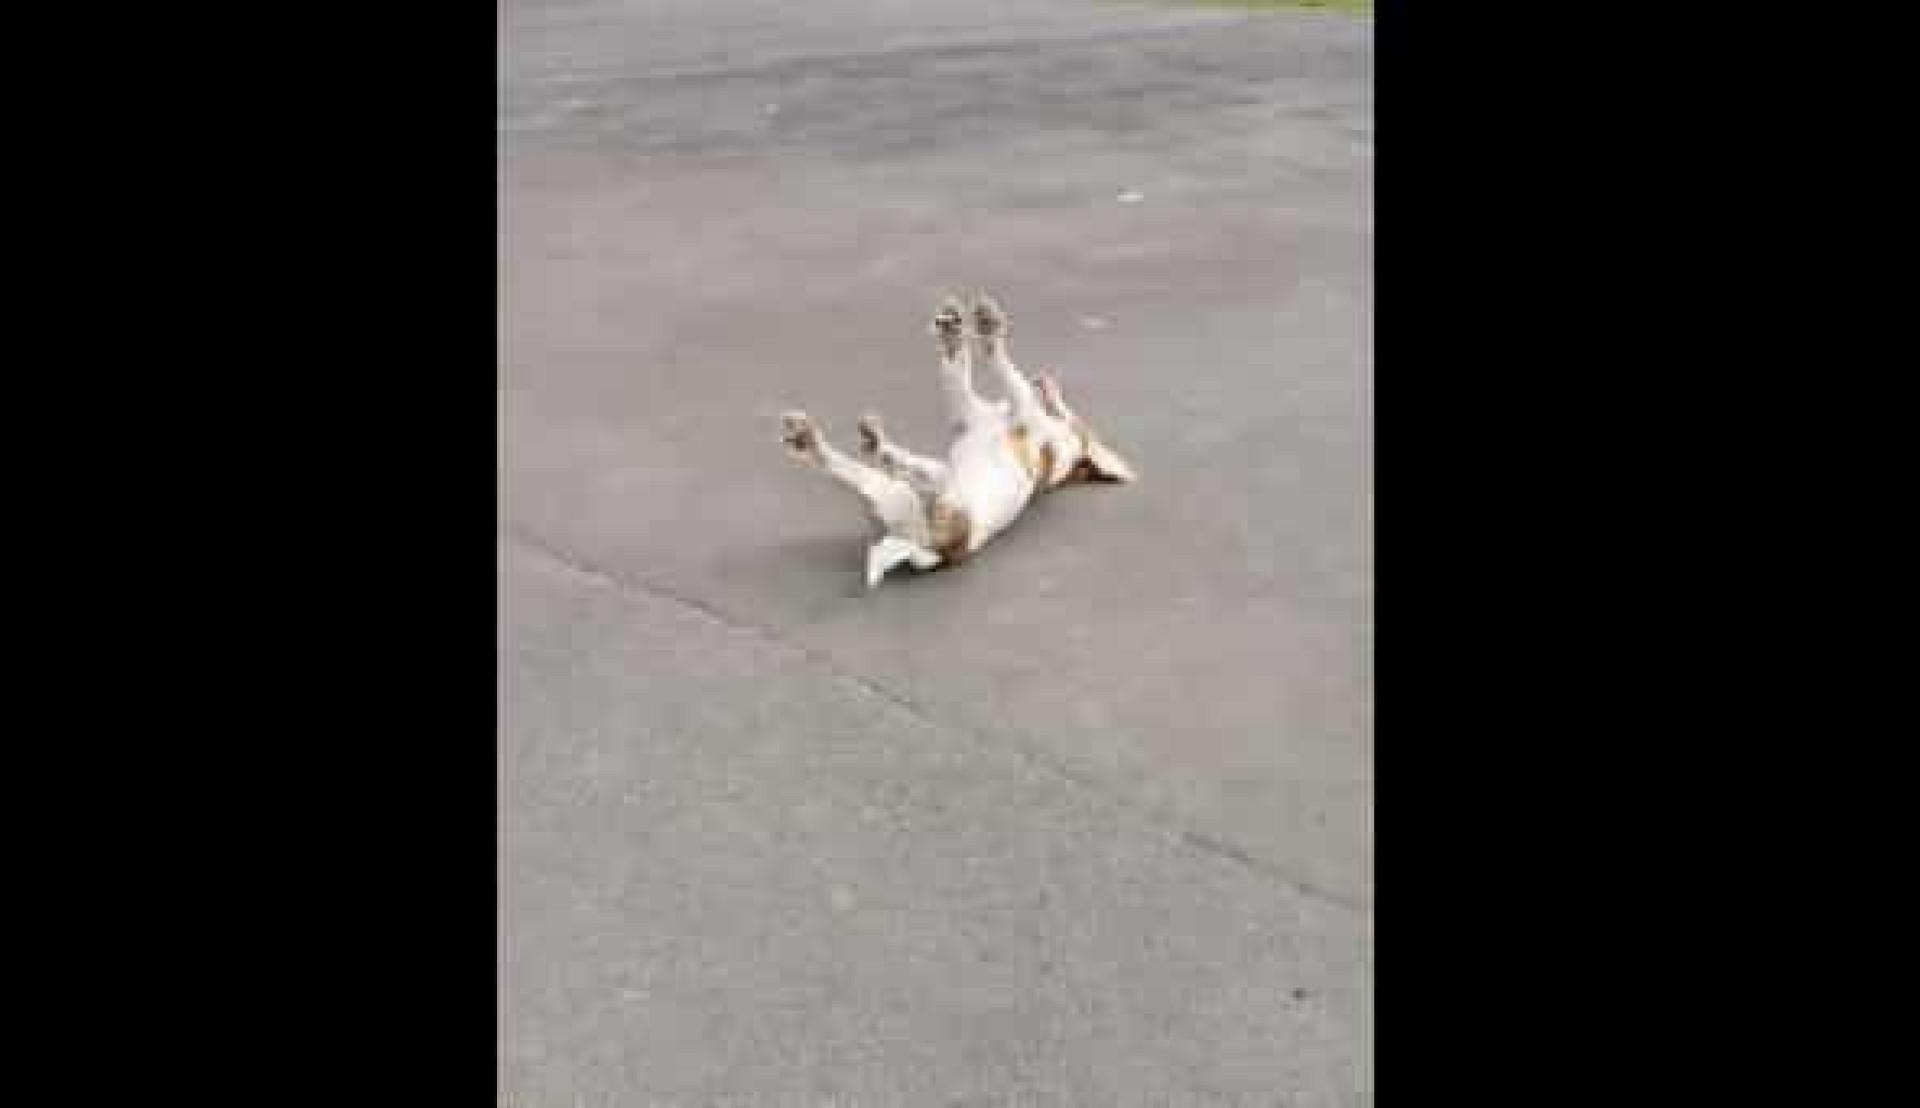 Este cão desmaia sempre que se entusiasma demais